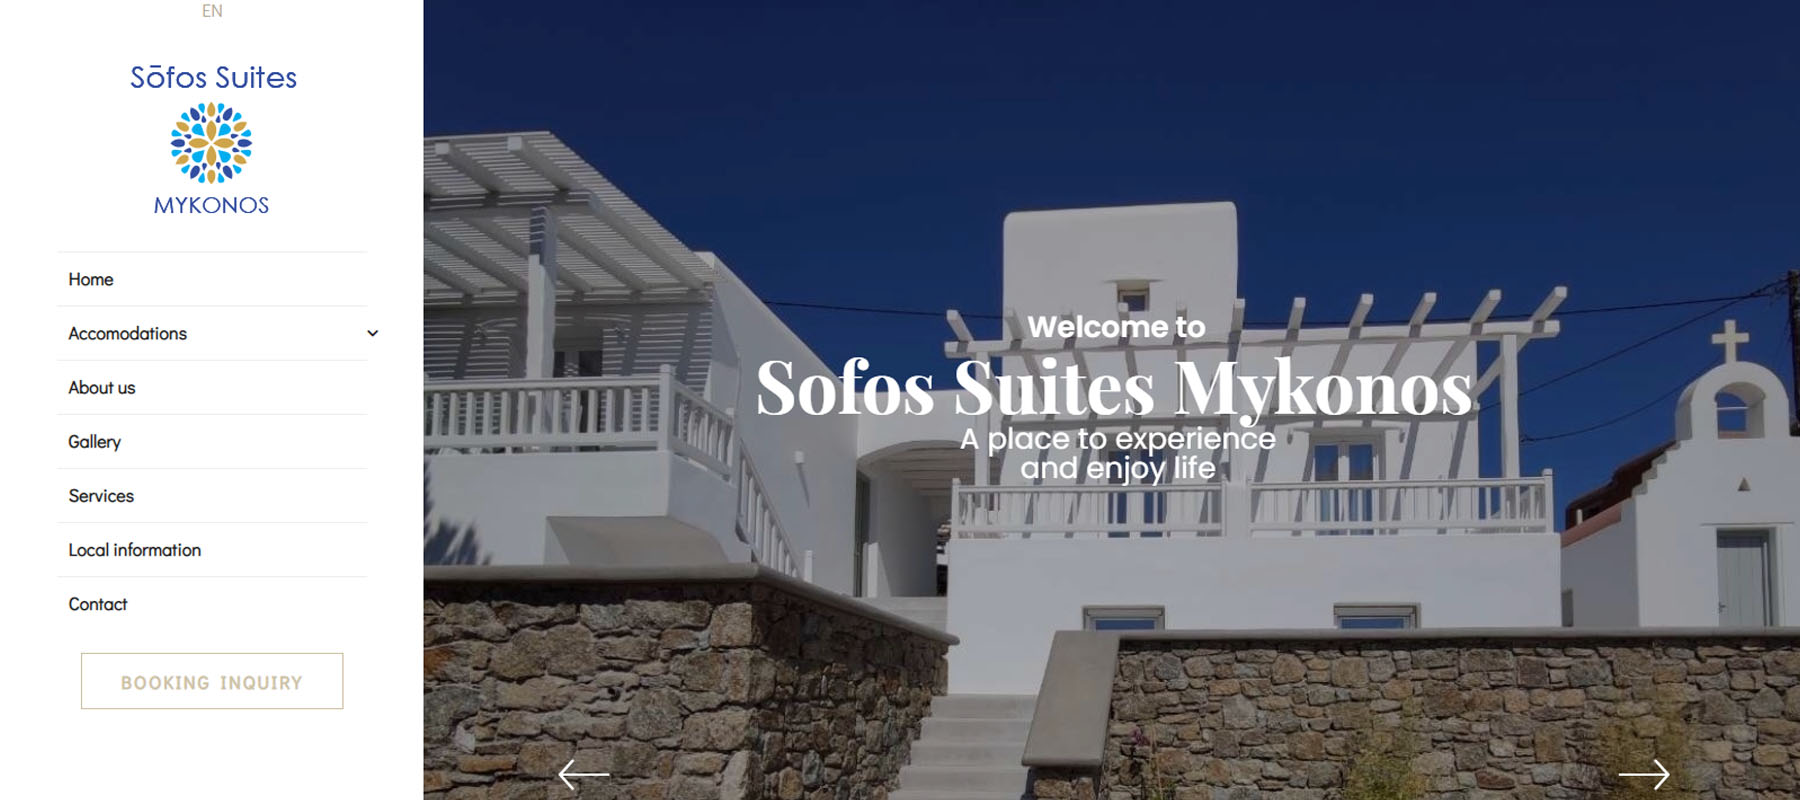 Sofos Suites Mykonos